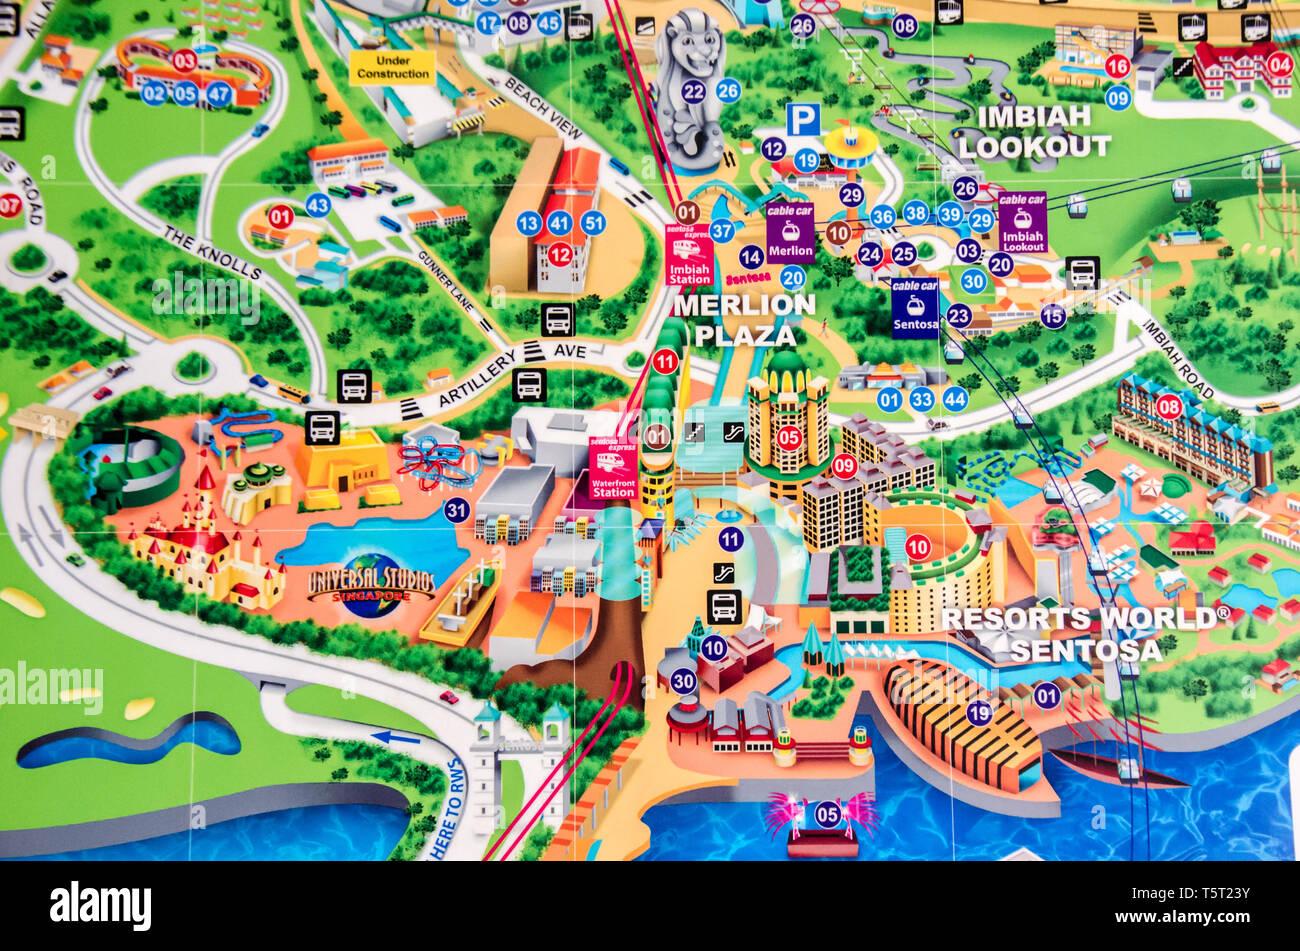 closeup shot of the Singapore Tourist map poster Stock Photo ... on singapore airport map, singapore district map, singapore oil map, singapore trade map, singapore climate, singapore places to visit, singapore city map, singapore neighborhoods, singapore hotels, singapore resource map, singapore mrt map 2013, singapore areas, singapore map directory, singapore subway system map, singapore sightseeing places, singapore travel, singapore 50th anniversary, singapore river map, singapore metro map,